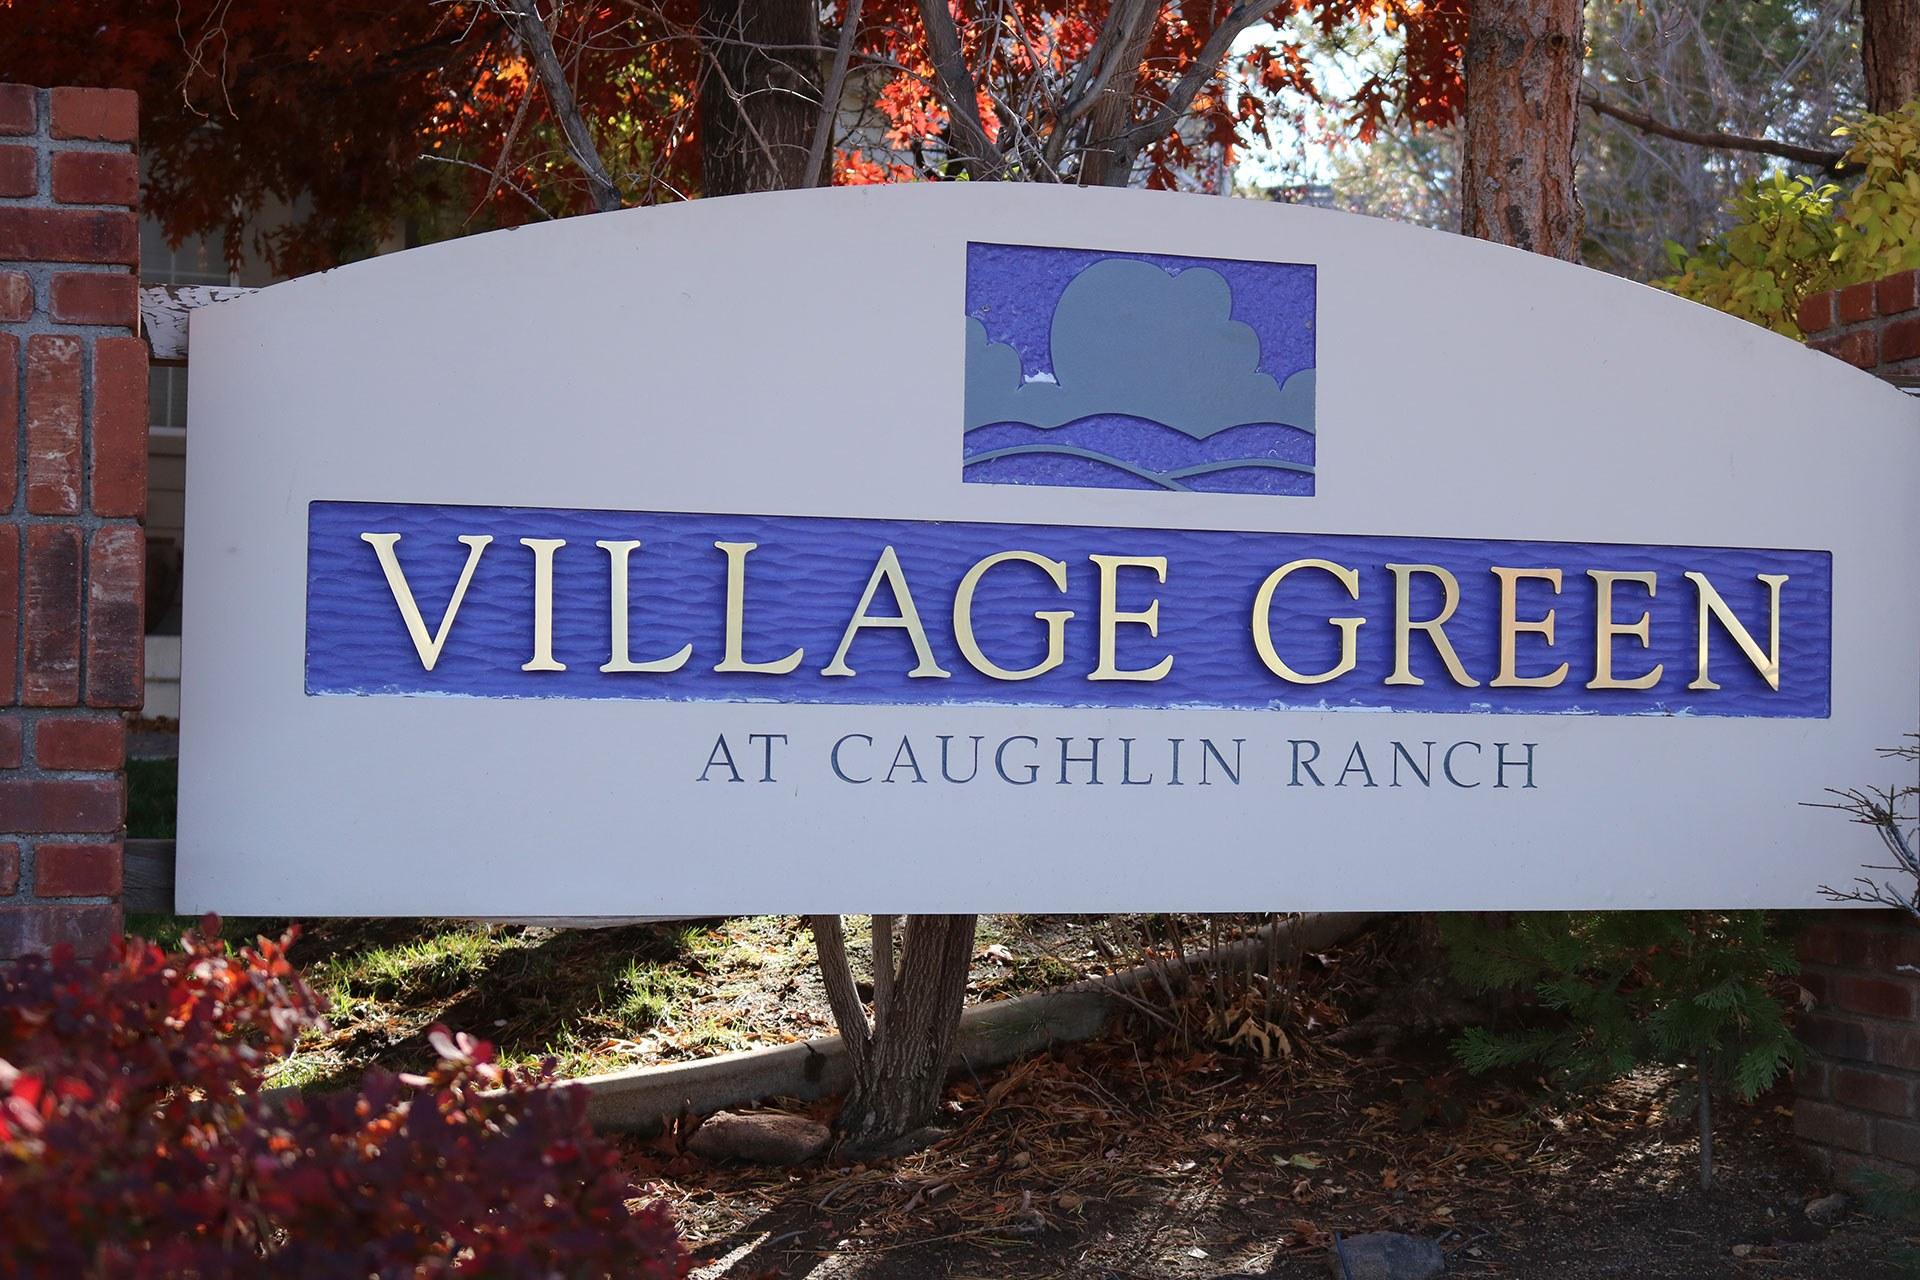 village green homes for sale reno nv